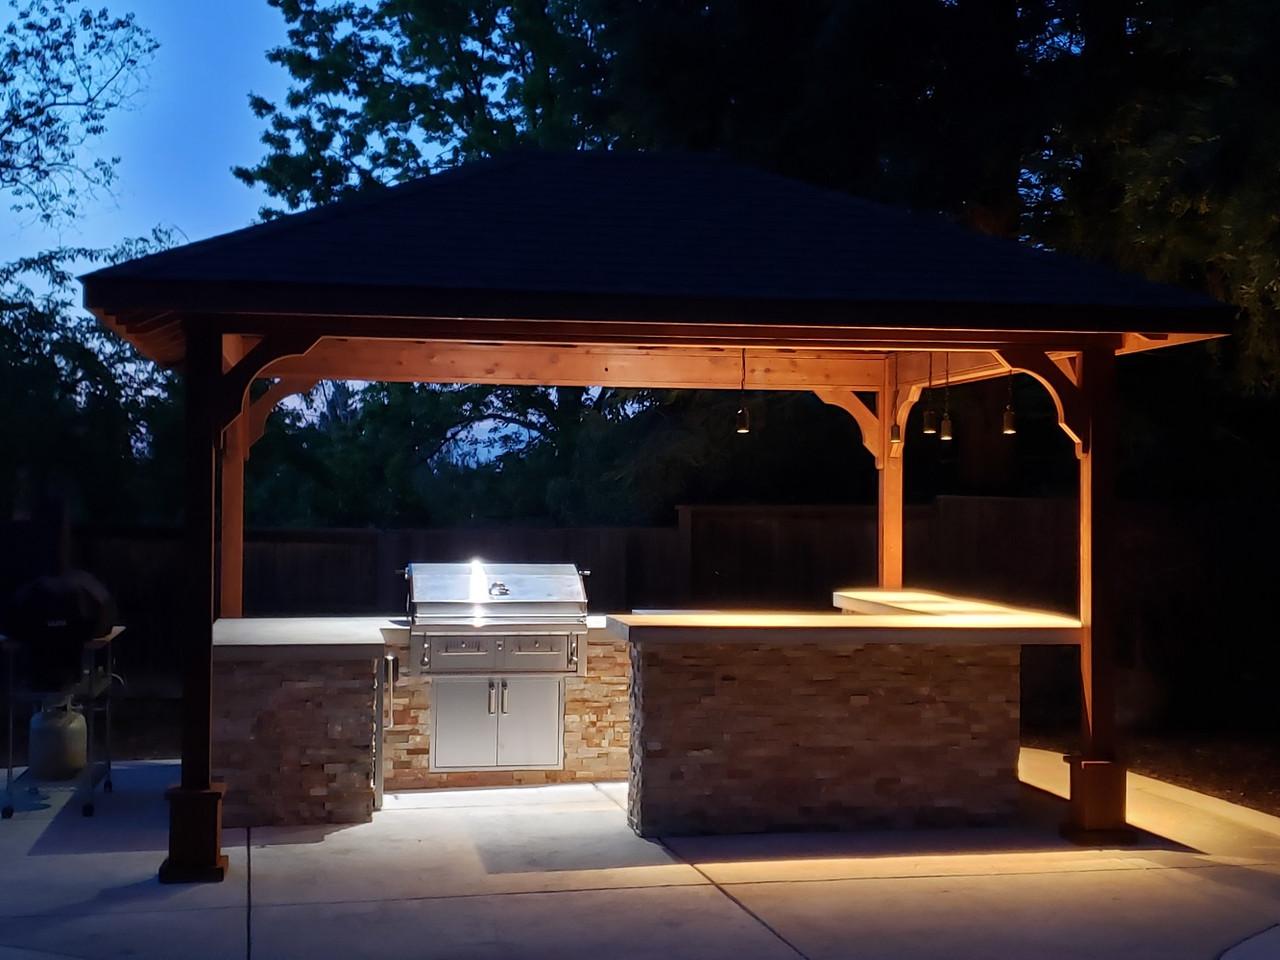 12x15 Traditional (Hip) Roof Cedar Pavilion Kit, Folsom, CA